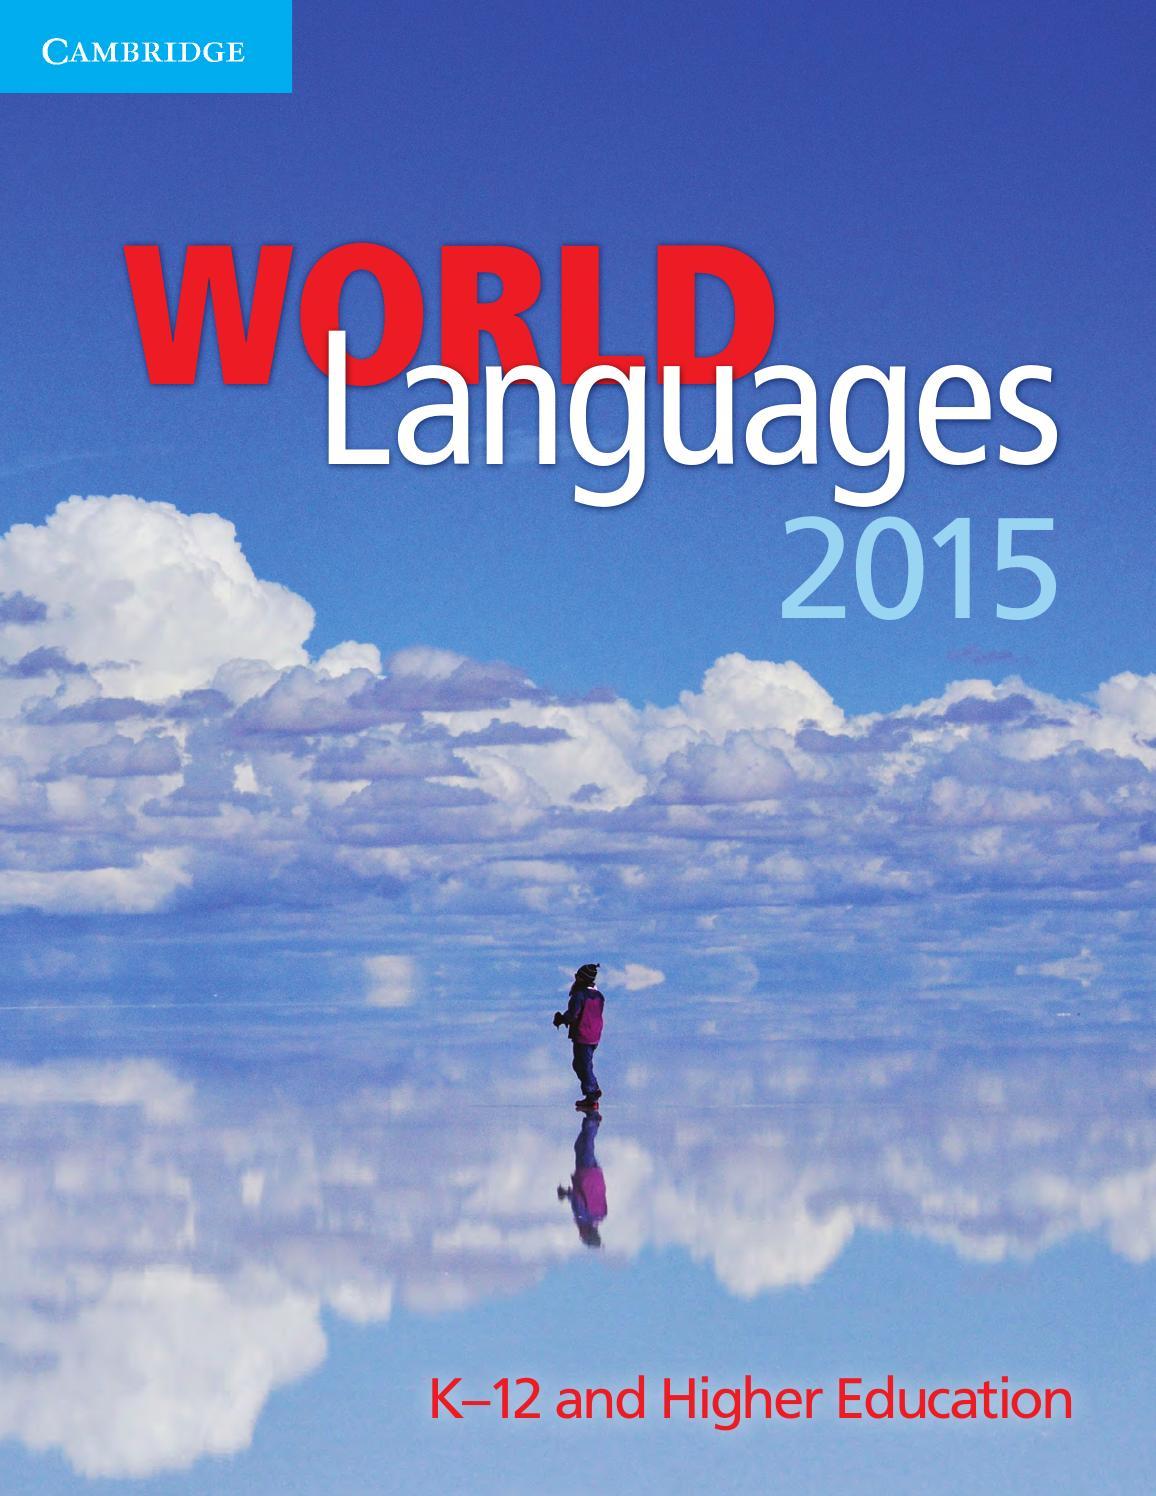 Cambridge world literatures catalogue 2015 by cambridge university cambridge world literatures catalogue 2015 by cambridge university press education issuu fandeluxe Gallery